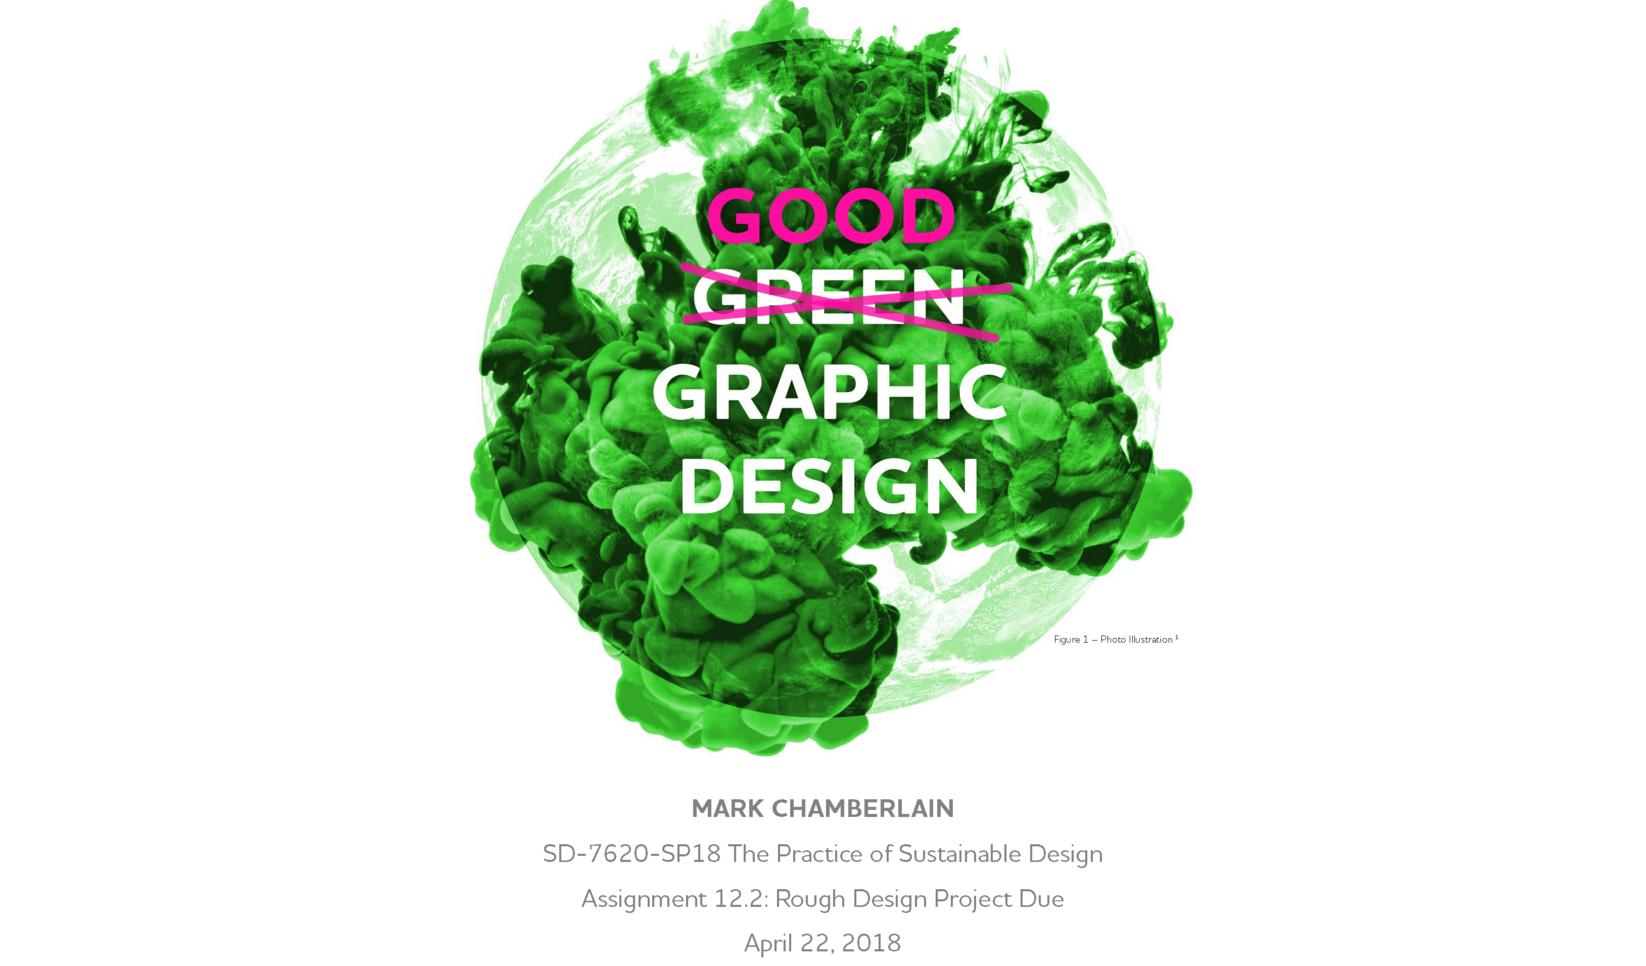 Graphic Design Presentation ; Marty Chamberlain